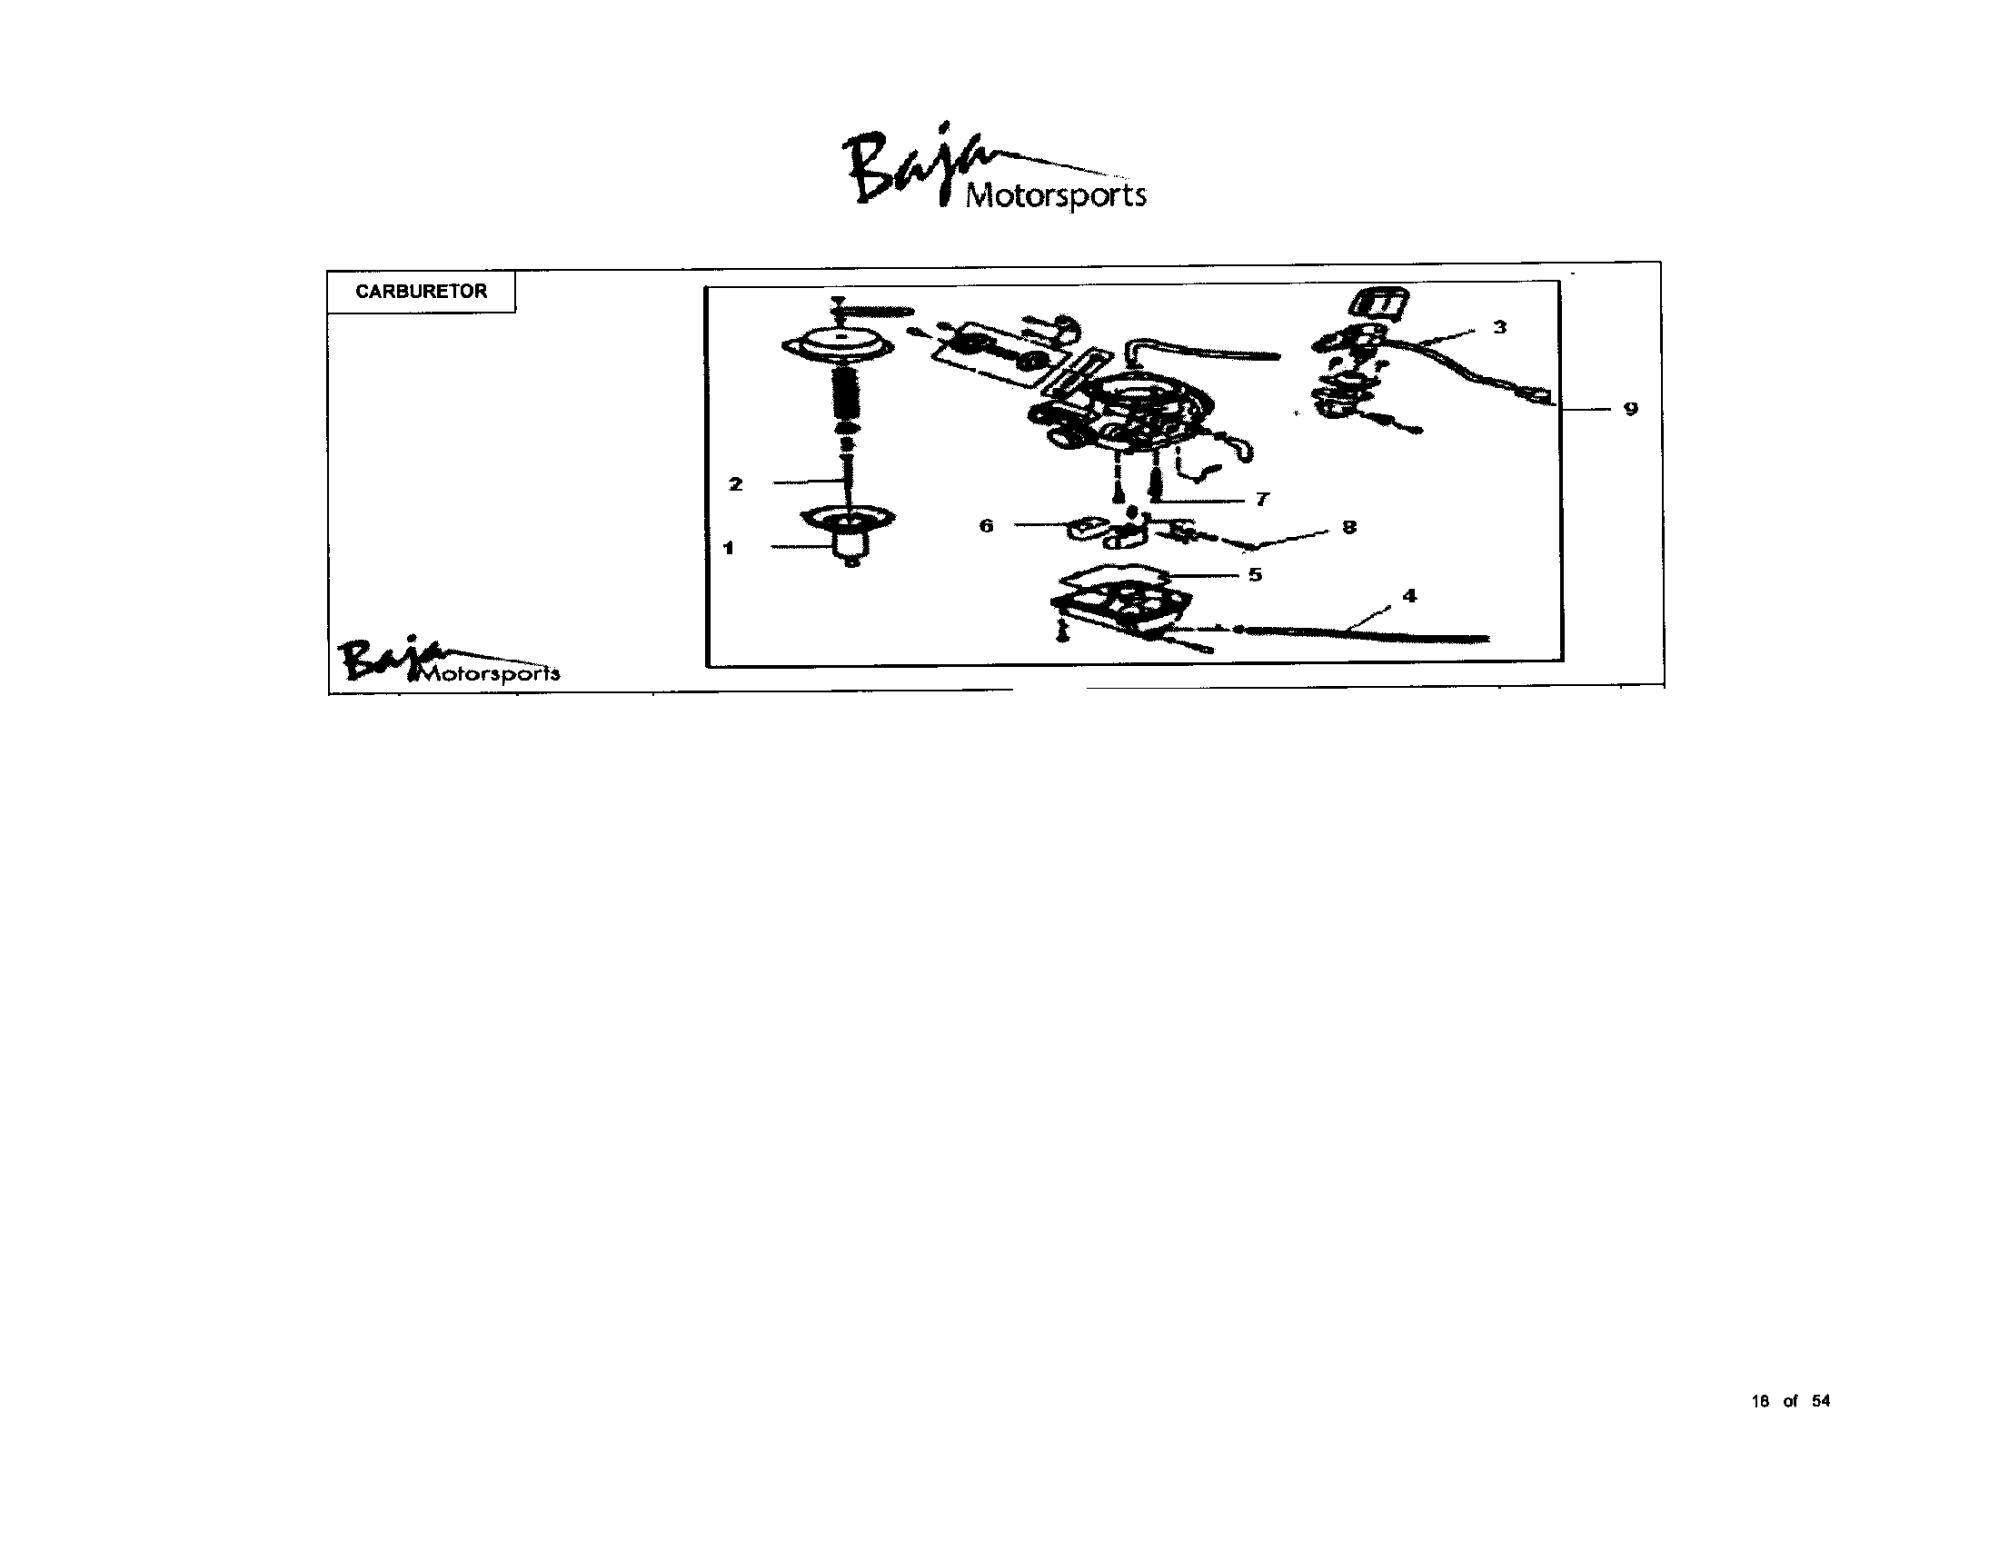 hight resolution of baja sc50 wiring diagram wiring diagram h8baja sc50 wiring harness wiring diagram baja 50 scooter battery